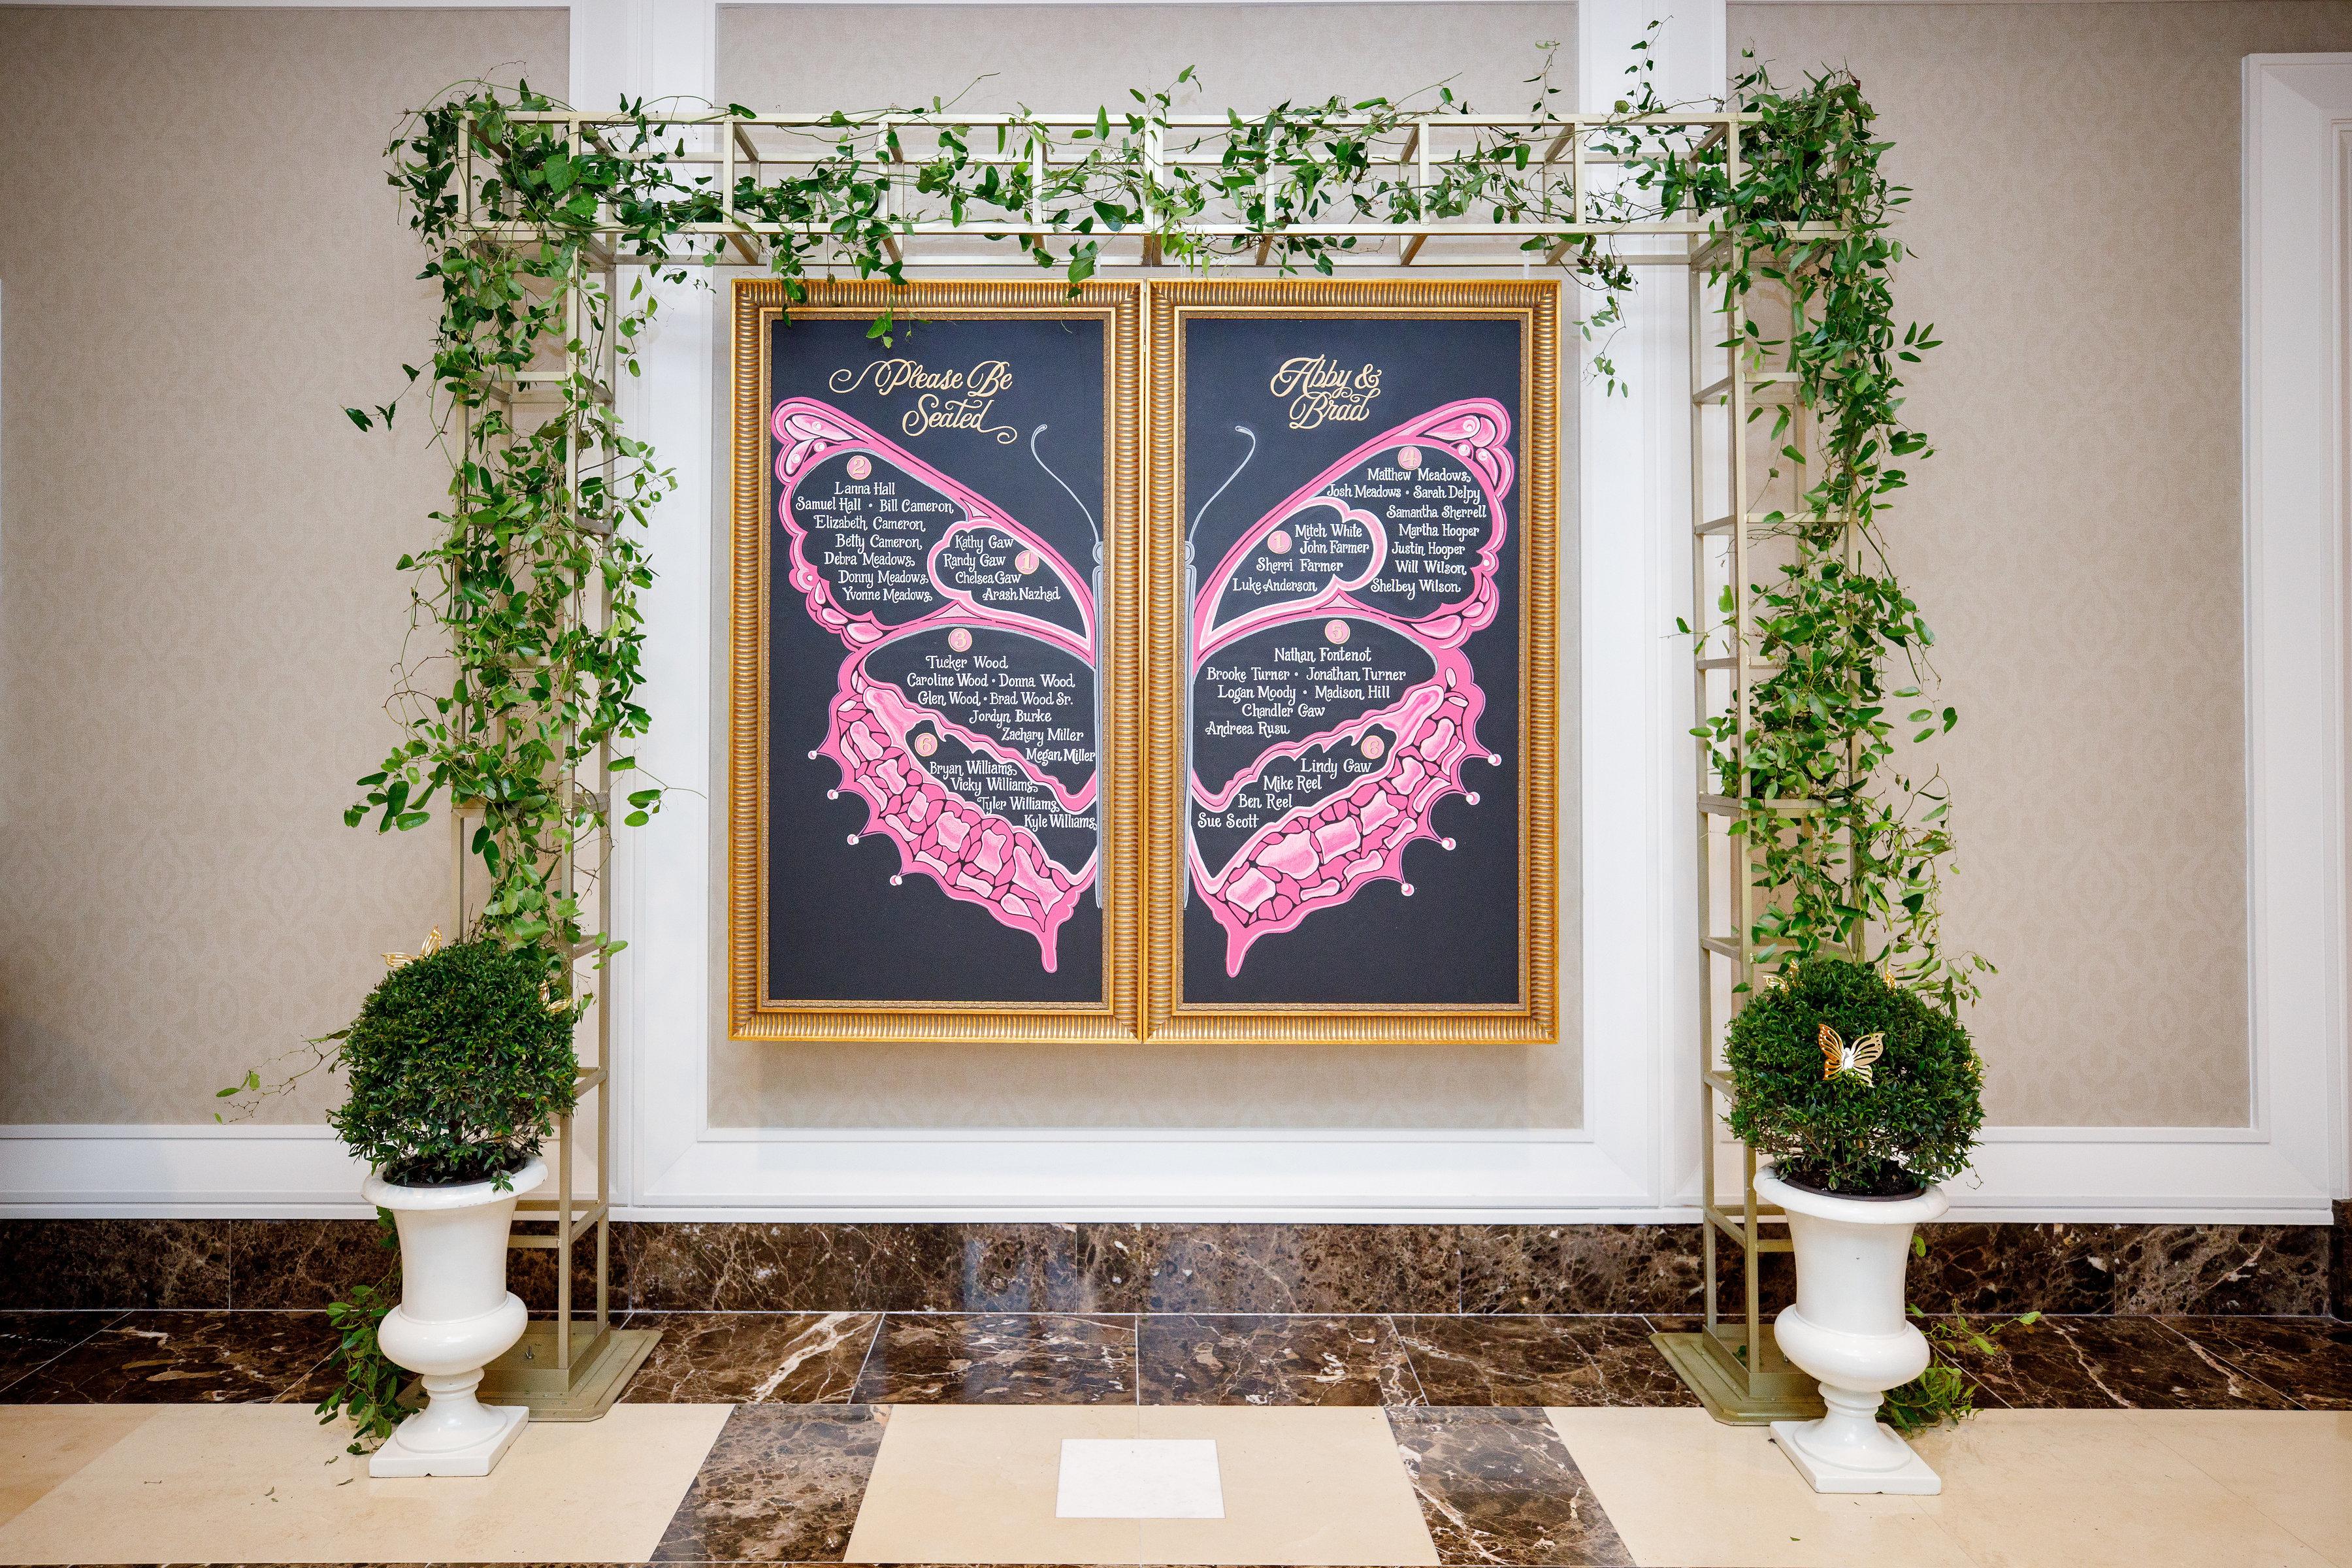 Abby and Brad's Wedding - Chalk Shop